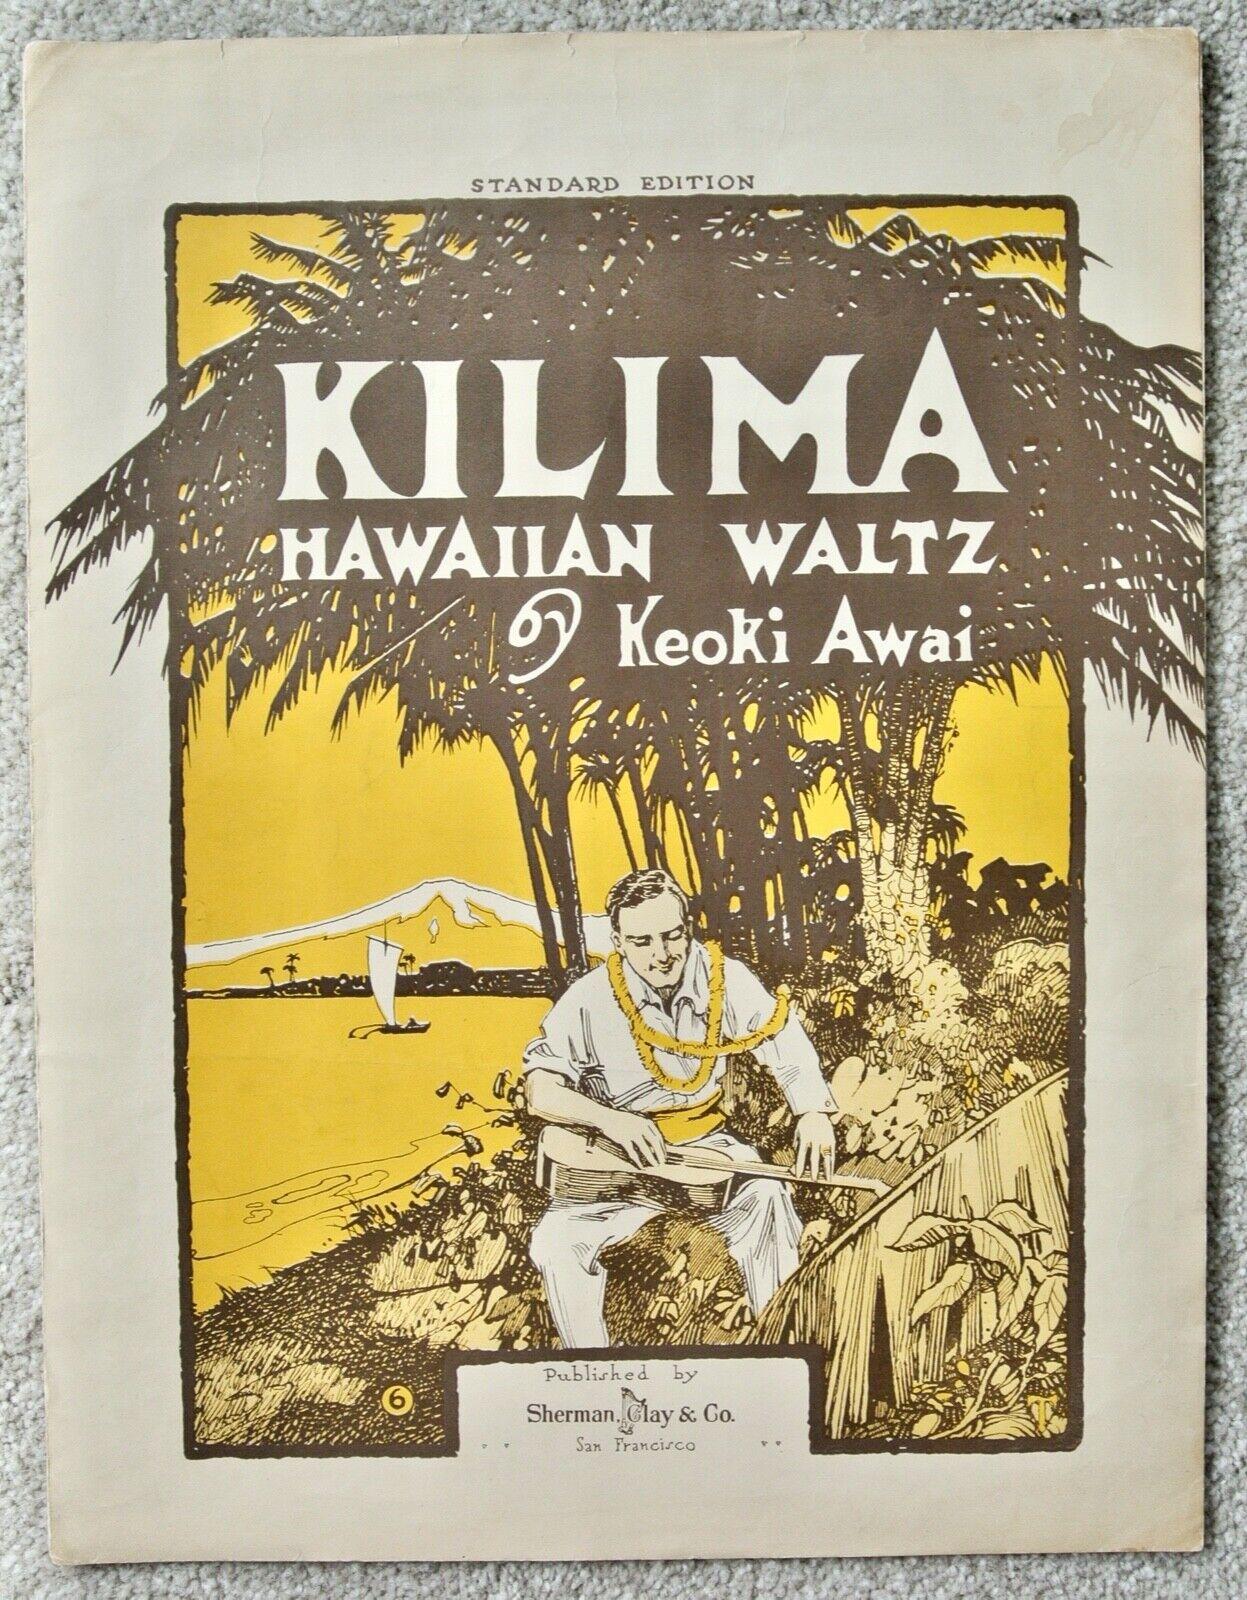 KILIMA Hawaiian Waltz Sheet Music 1916 Aloha Hawaii Piano Solo Large Format - $14.95